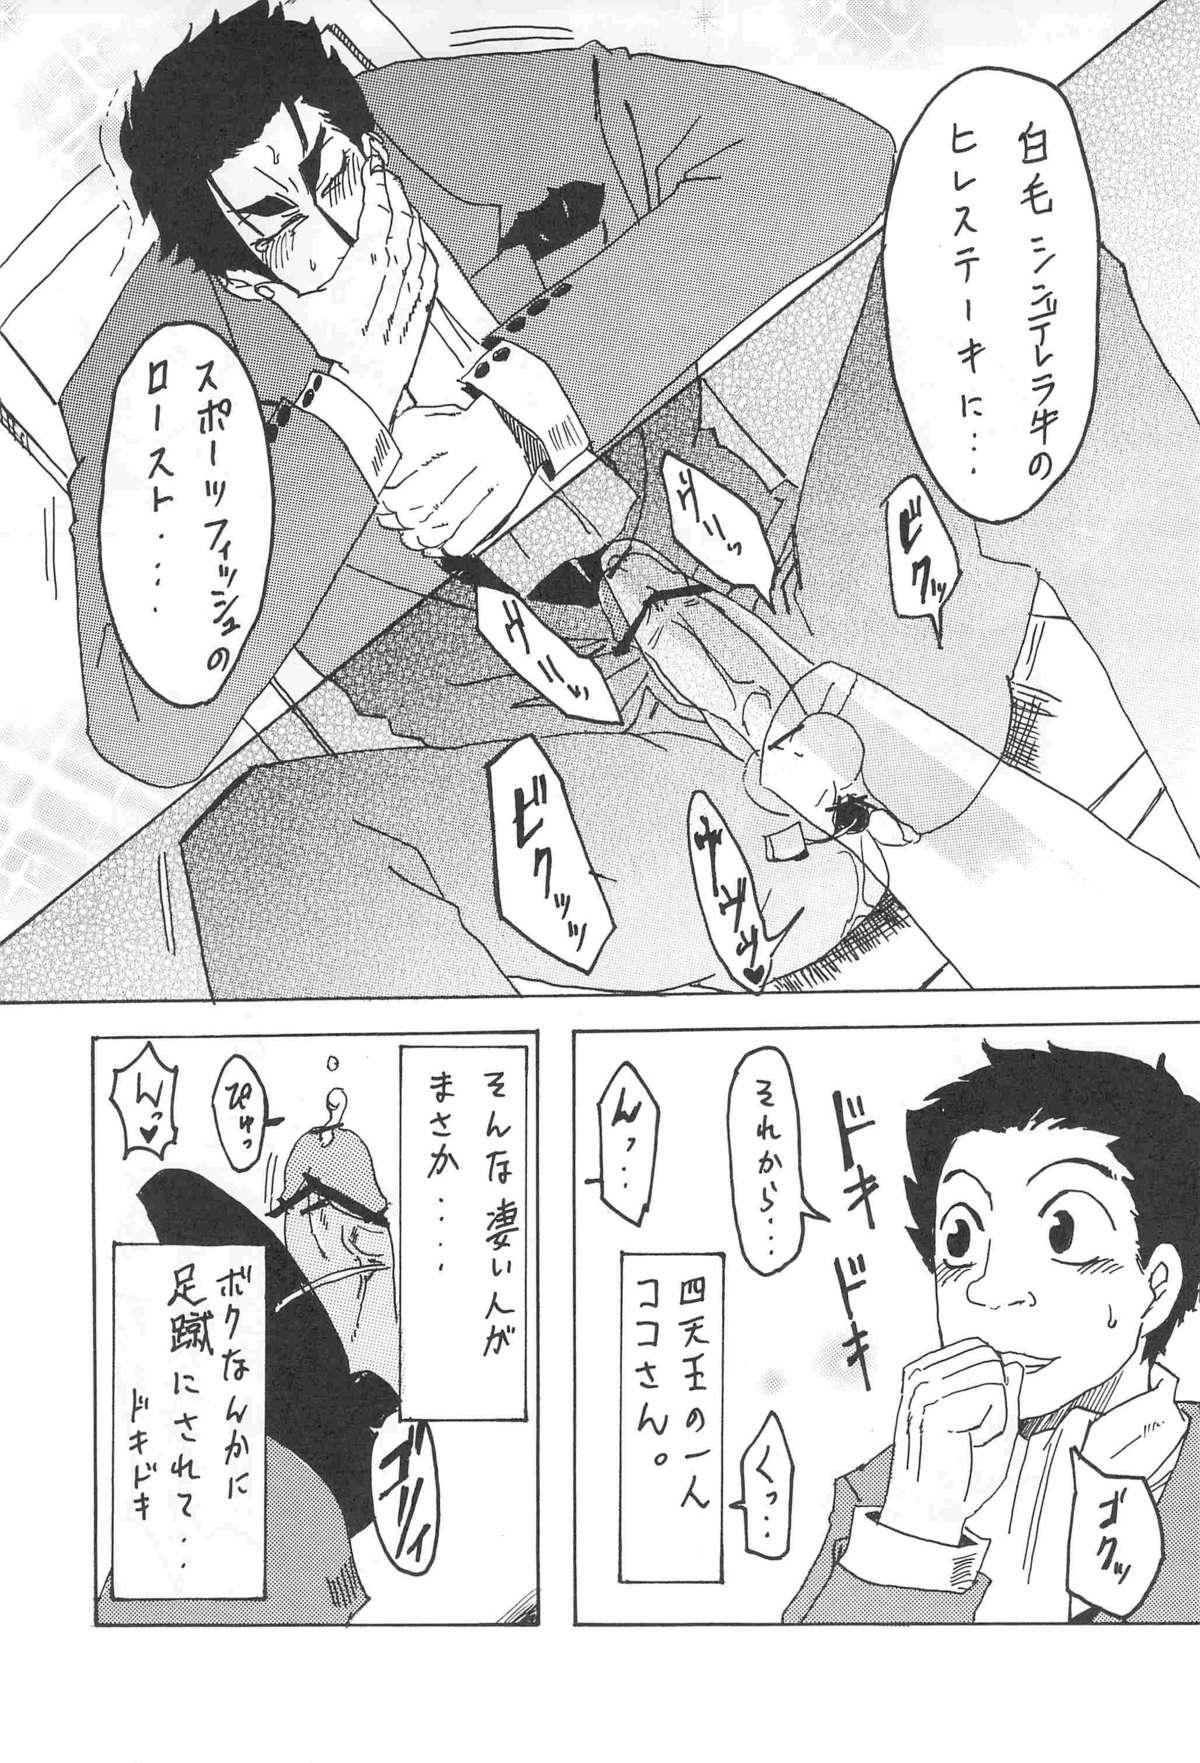 [Kijima Hyougo,Jun'ai Meringue-don,RIN!] [msbt] (Toriko) 10